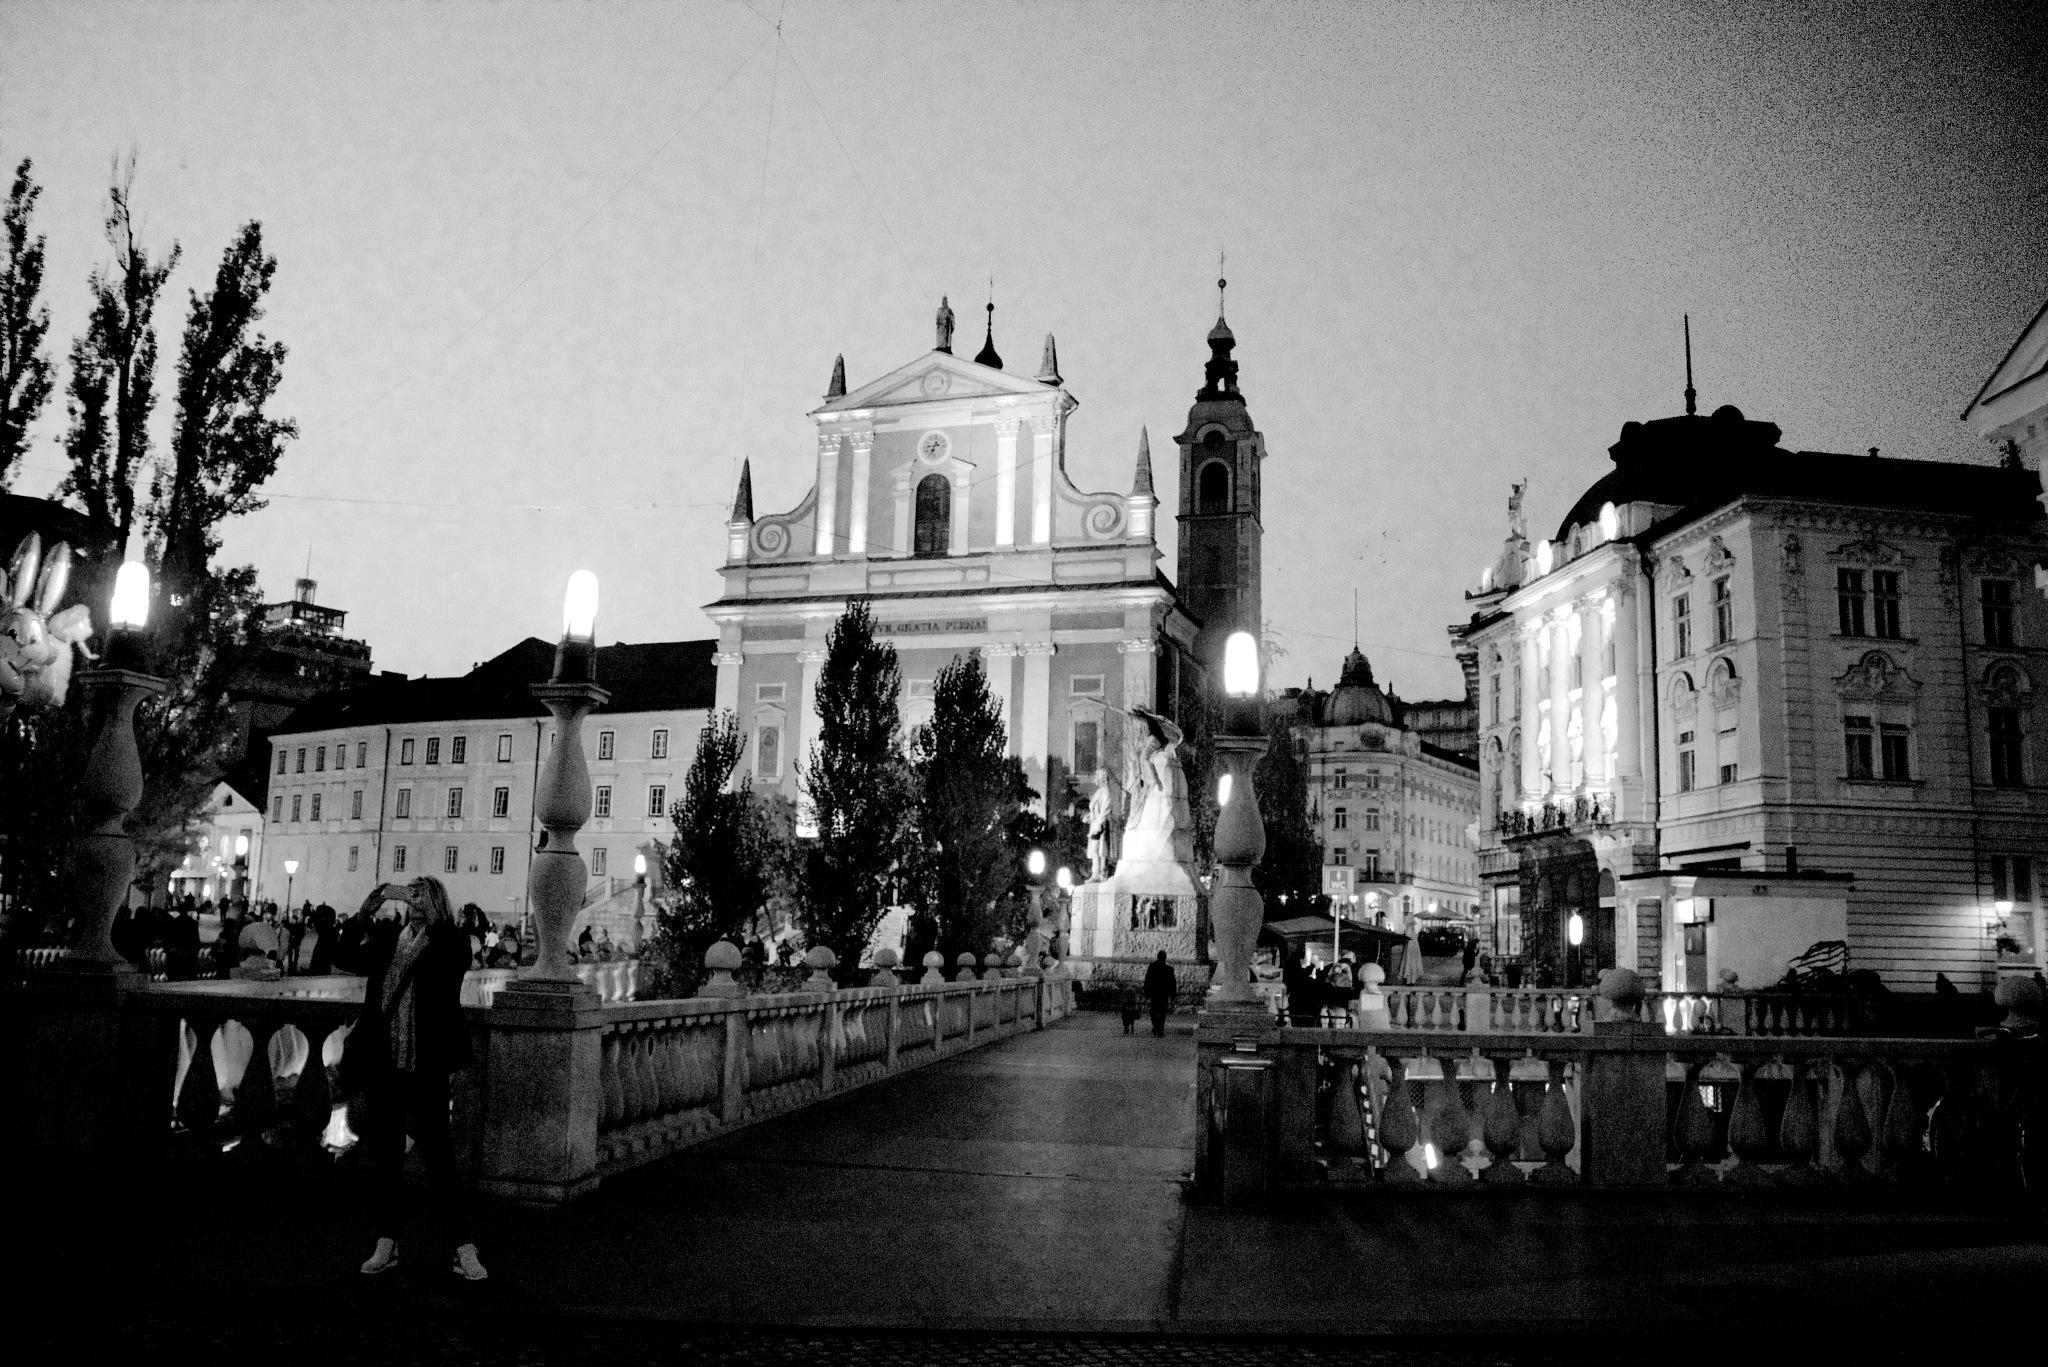 Ljubljana (CR2) by zvnktomasevic